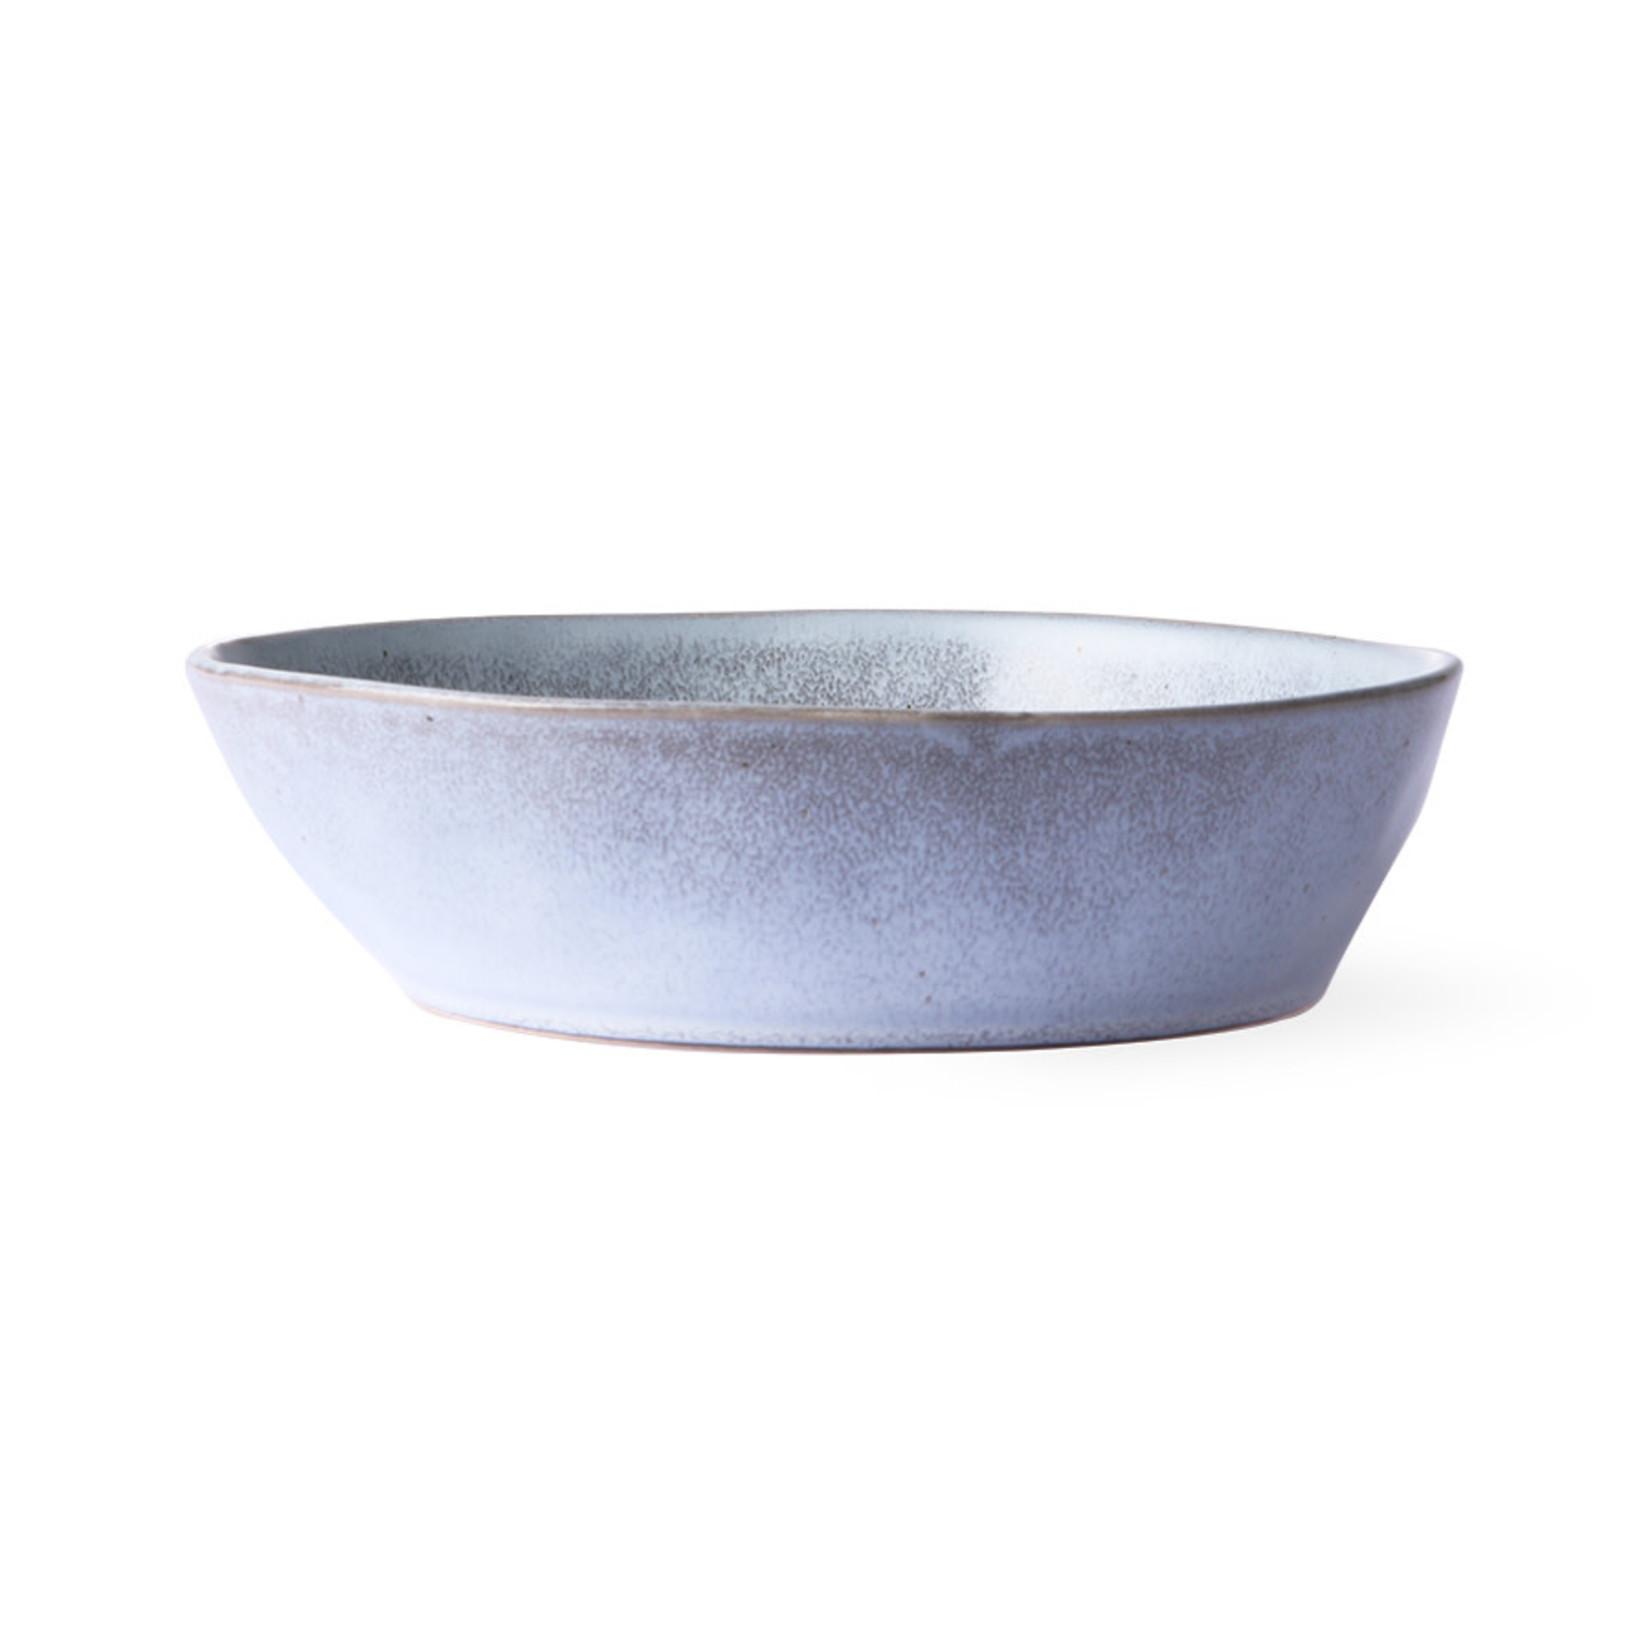 HK Living HK Living bold & basic ceramics: rustic grey bowl M